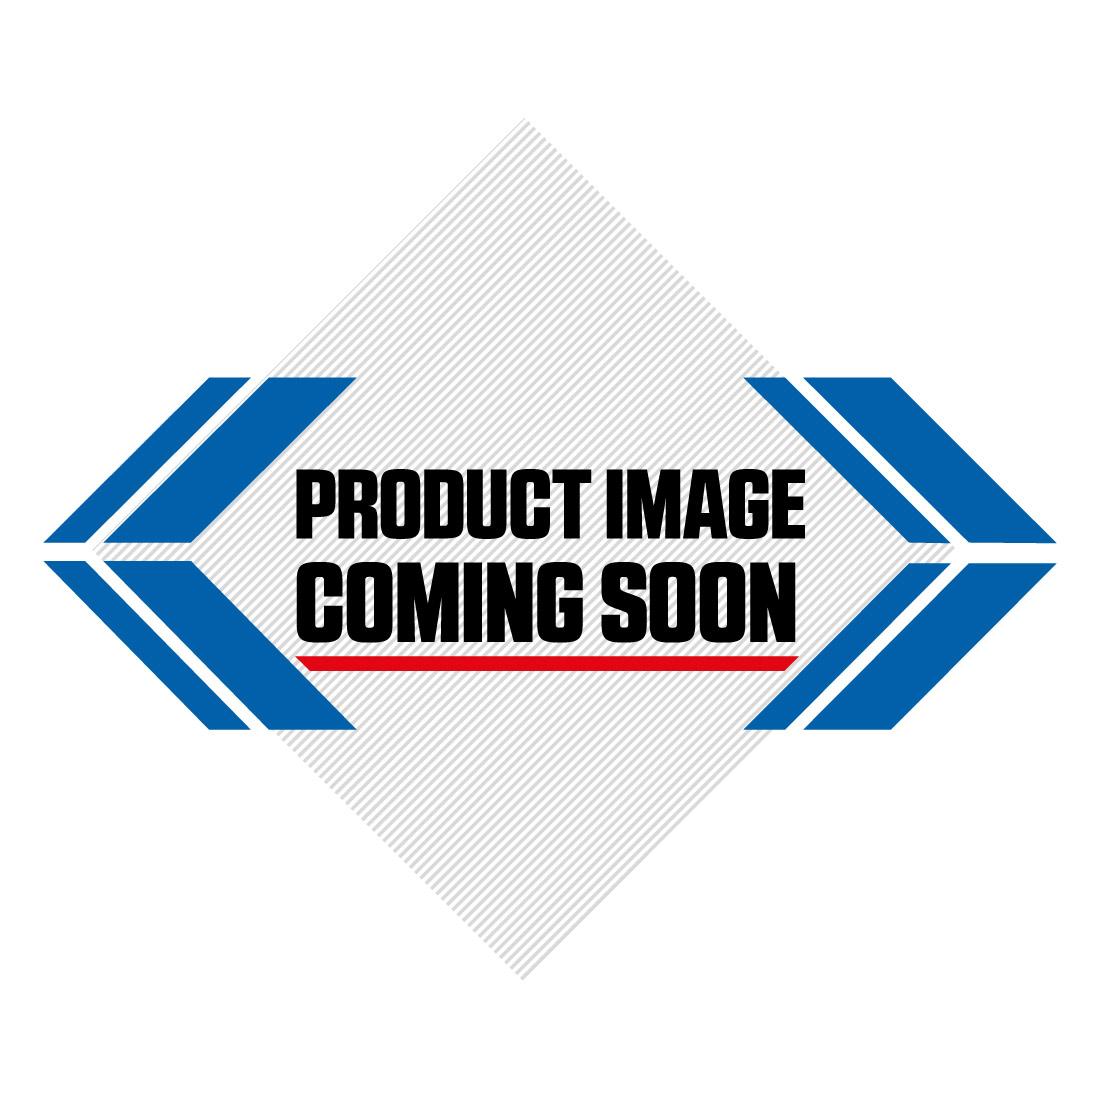 UFO KTM Plastic Kit SX 125 150 250 SXF 250 350 450 (16-18) OEM 16 Image-0